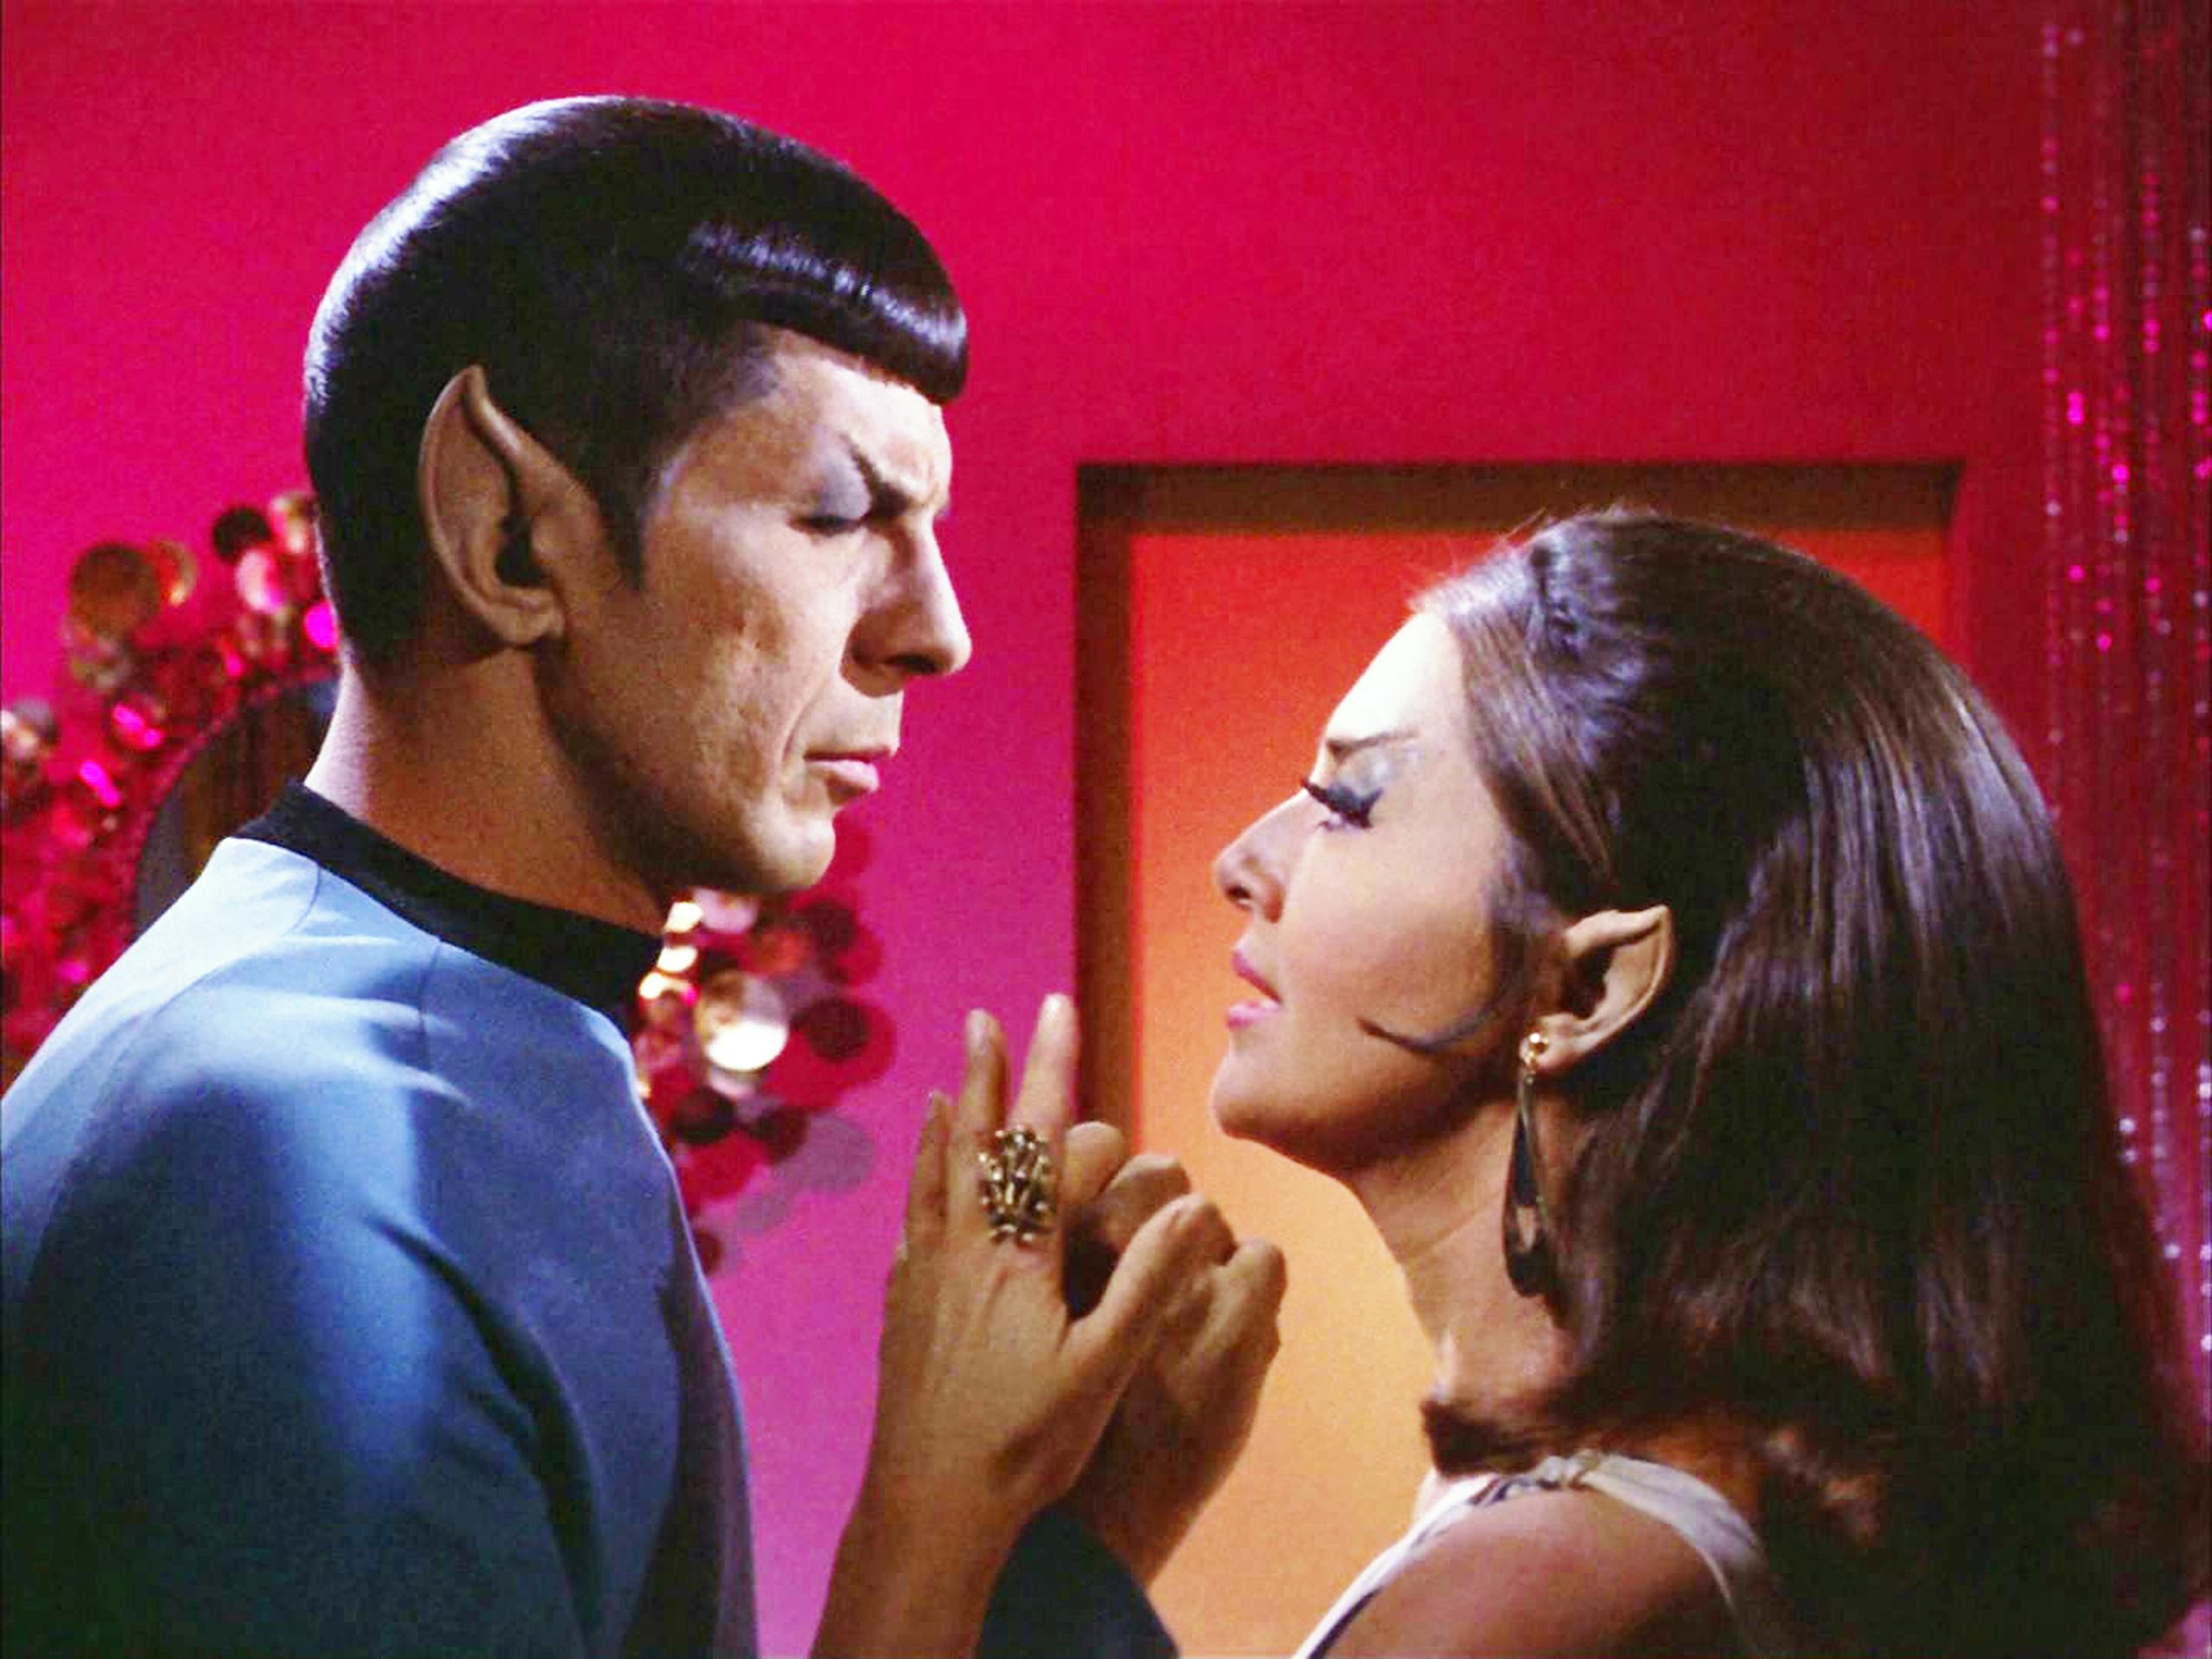 Leonard Nimoy as Mr. Spock and Joanne Linville as Romulan Commander in the Star Trek: The Original Series, Sept. 27, 1968.